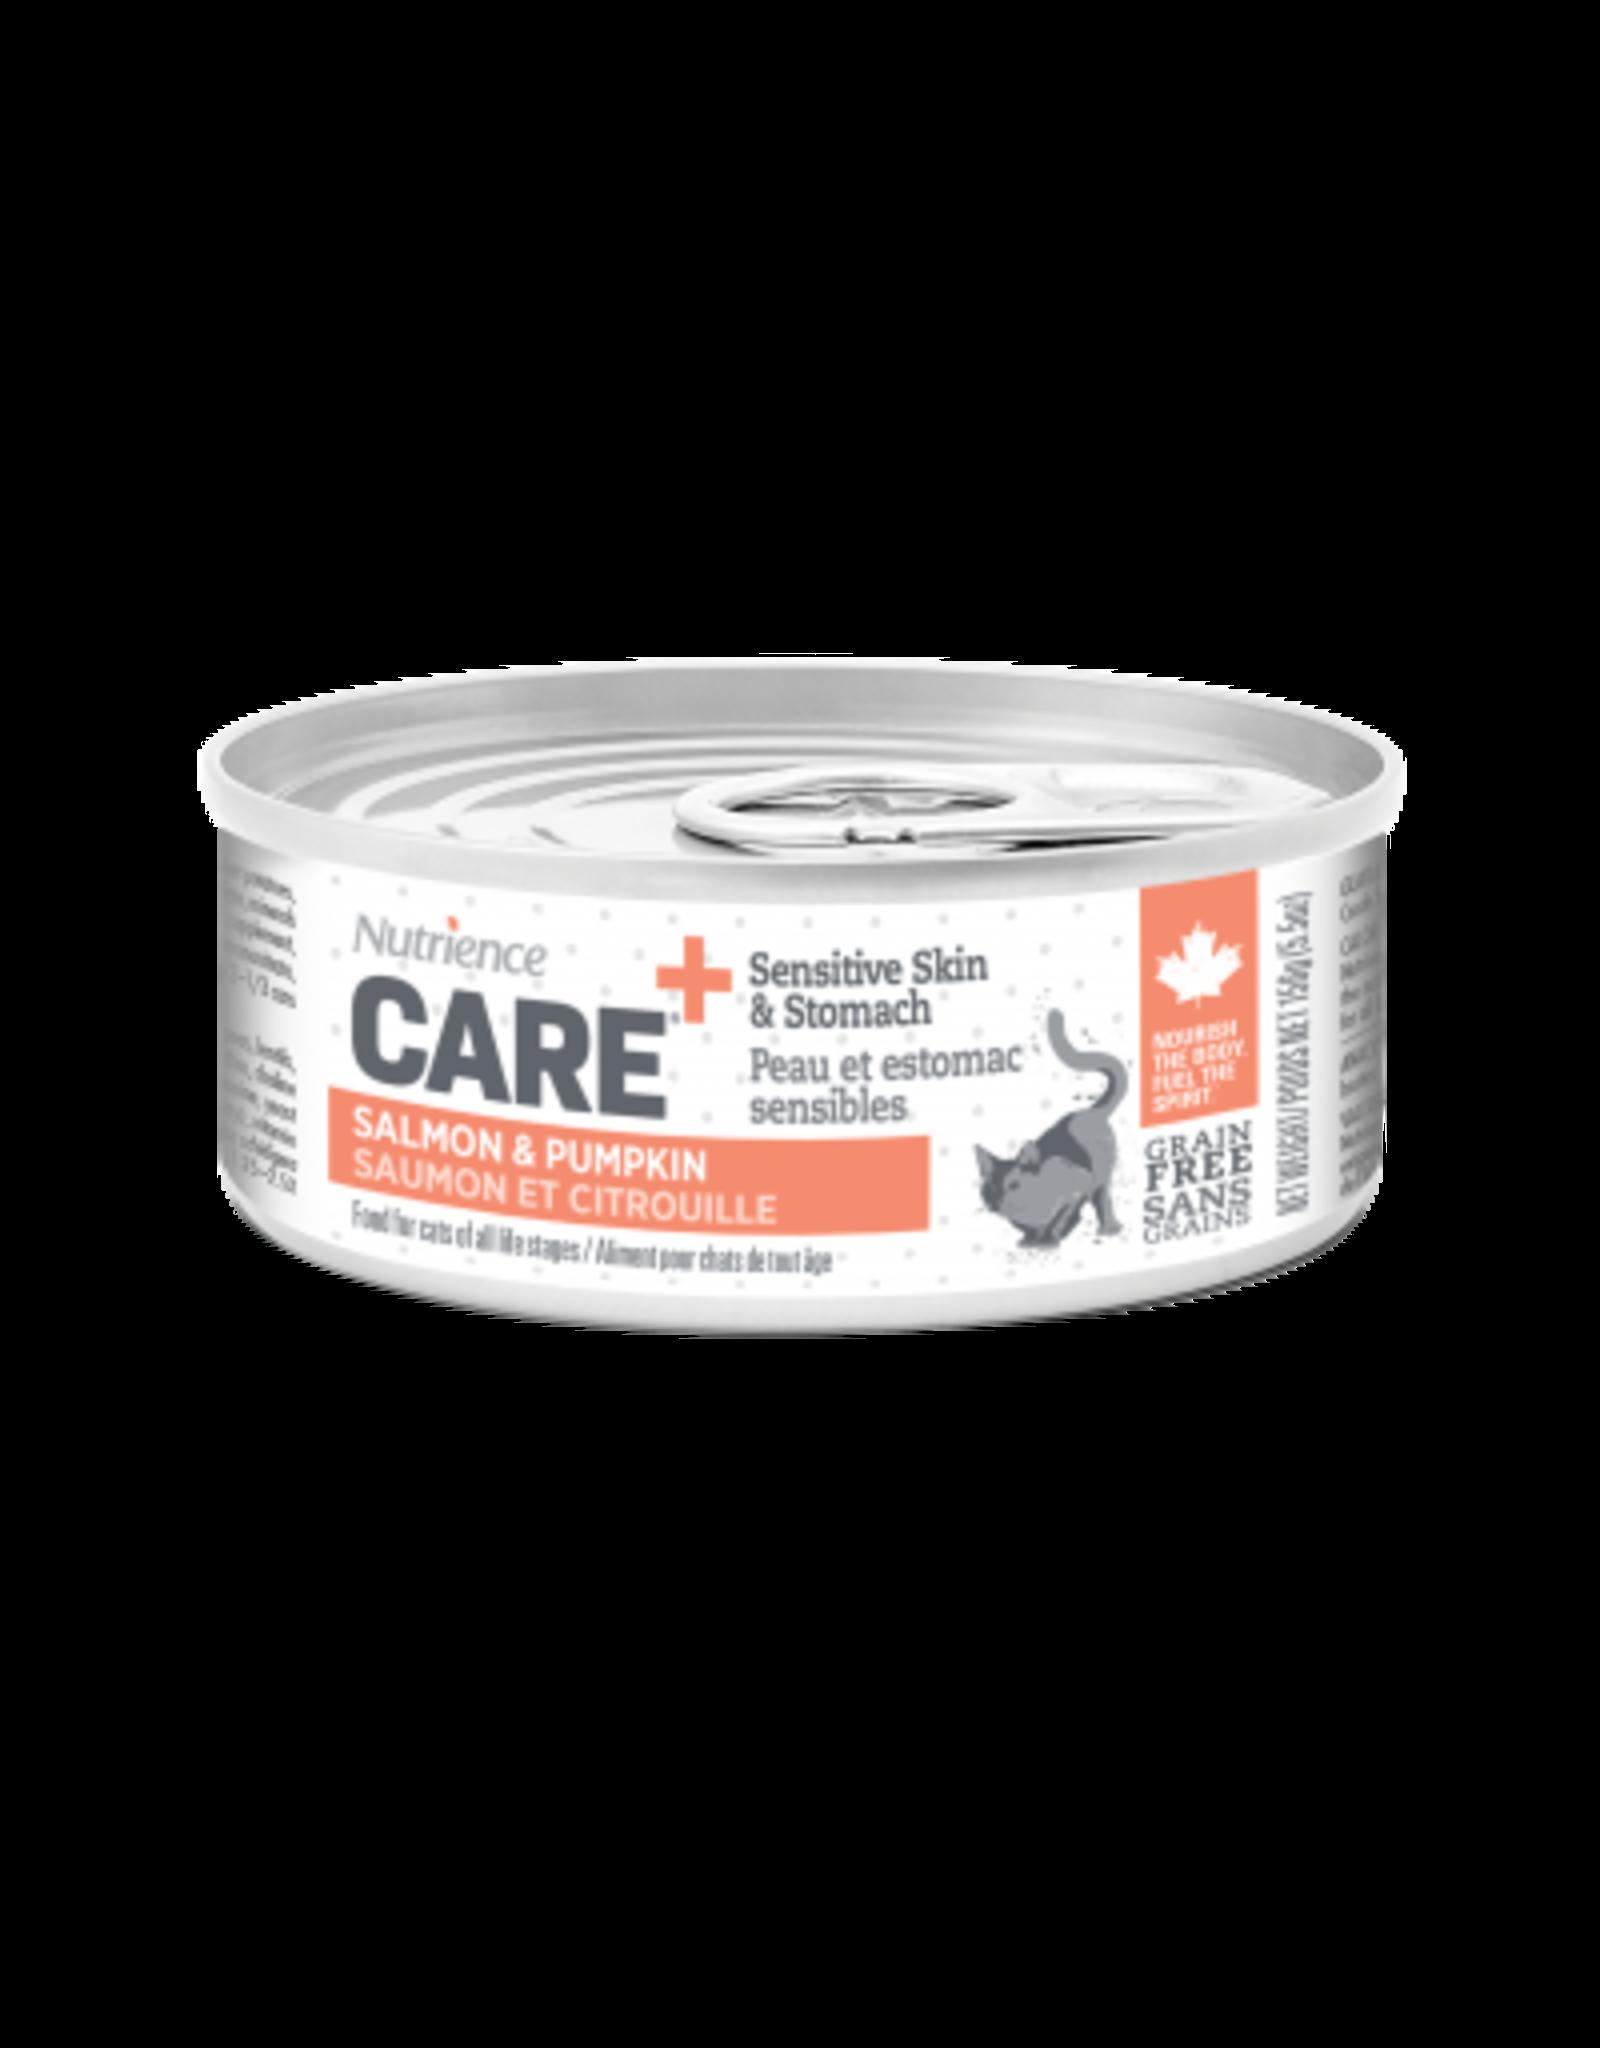 Nutrience Nutrience Care+ Sensitive Skin & Stomach Cat 5.5oz